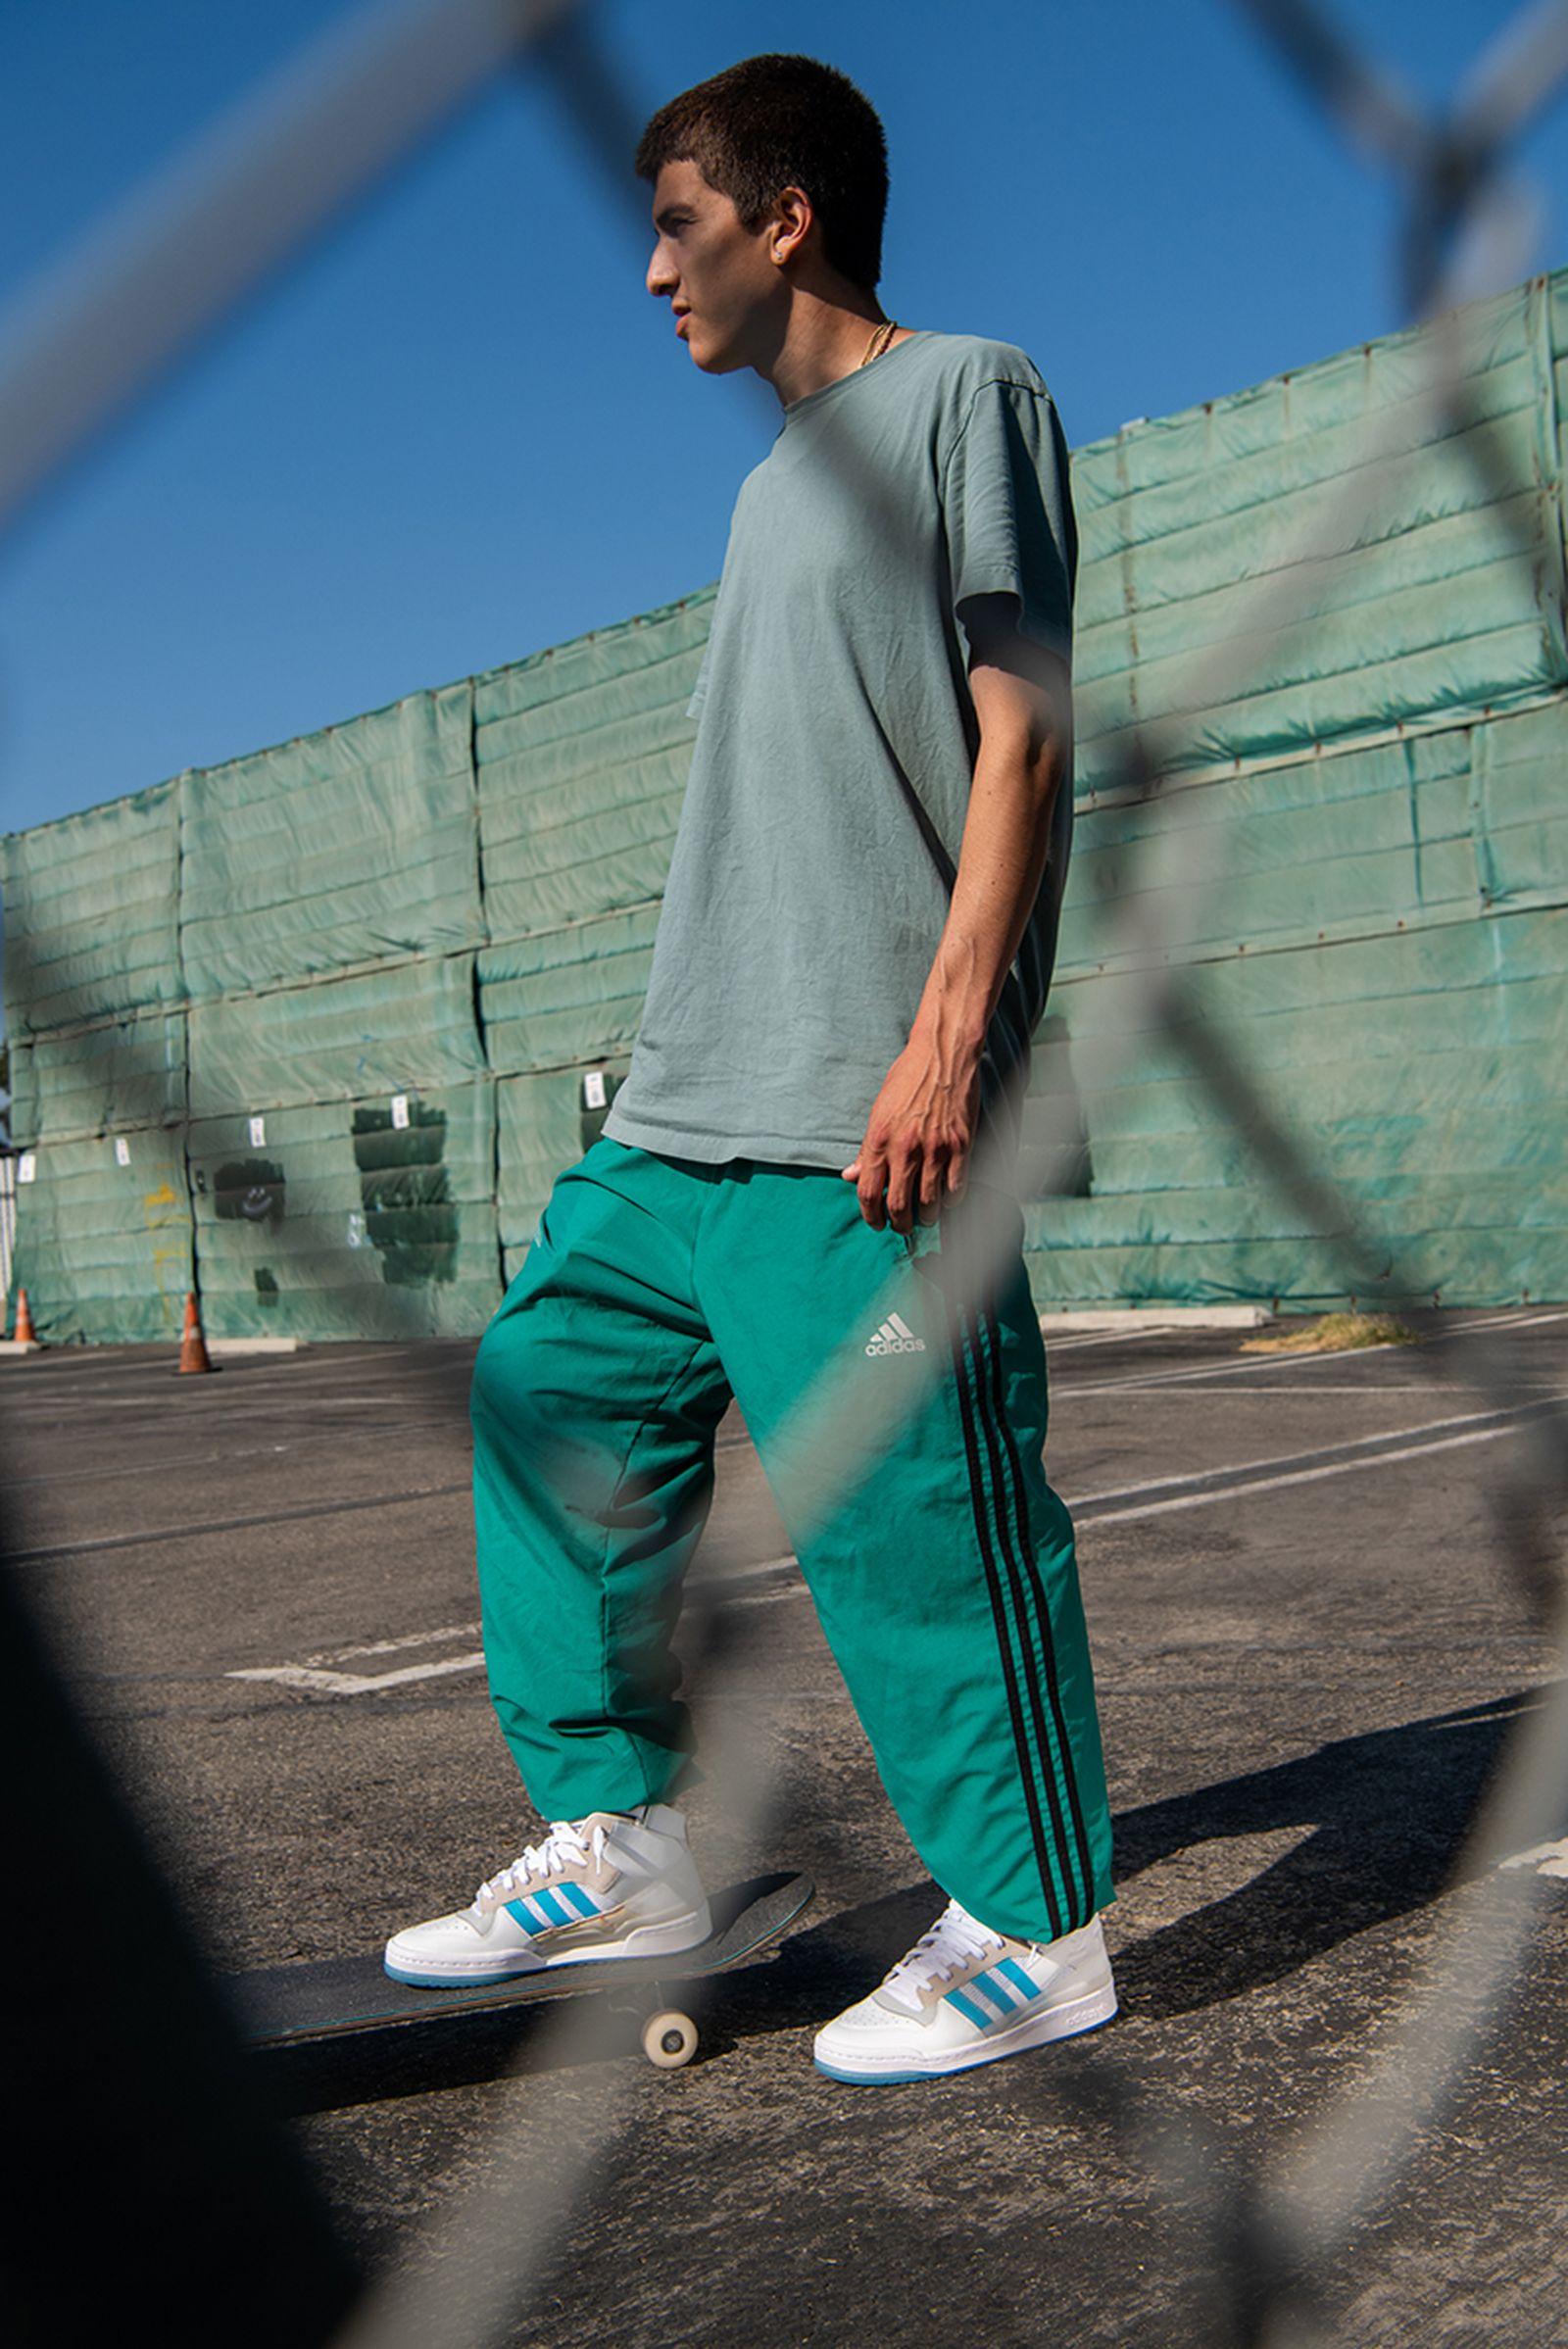 adidas-skateboarding-forum-84-adv-diego-najera-release-date-price-04